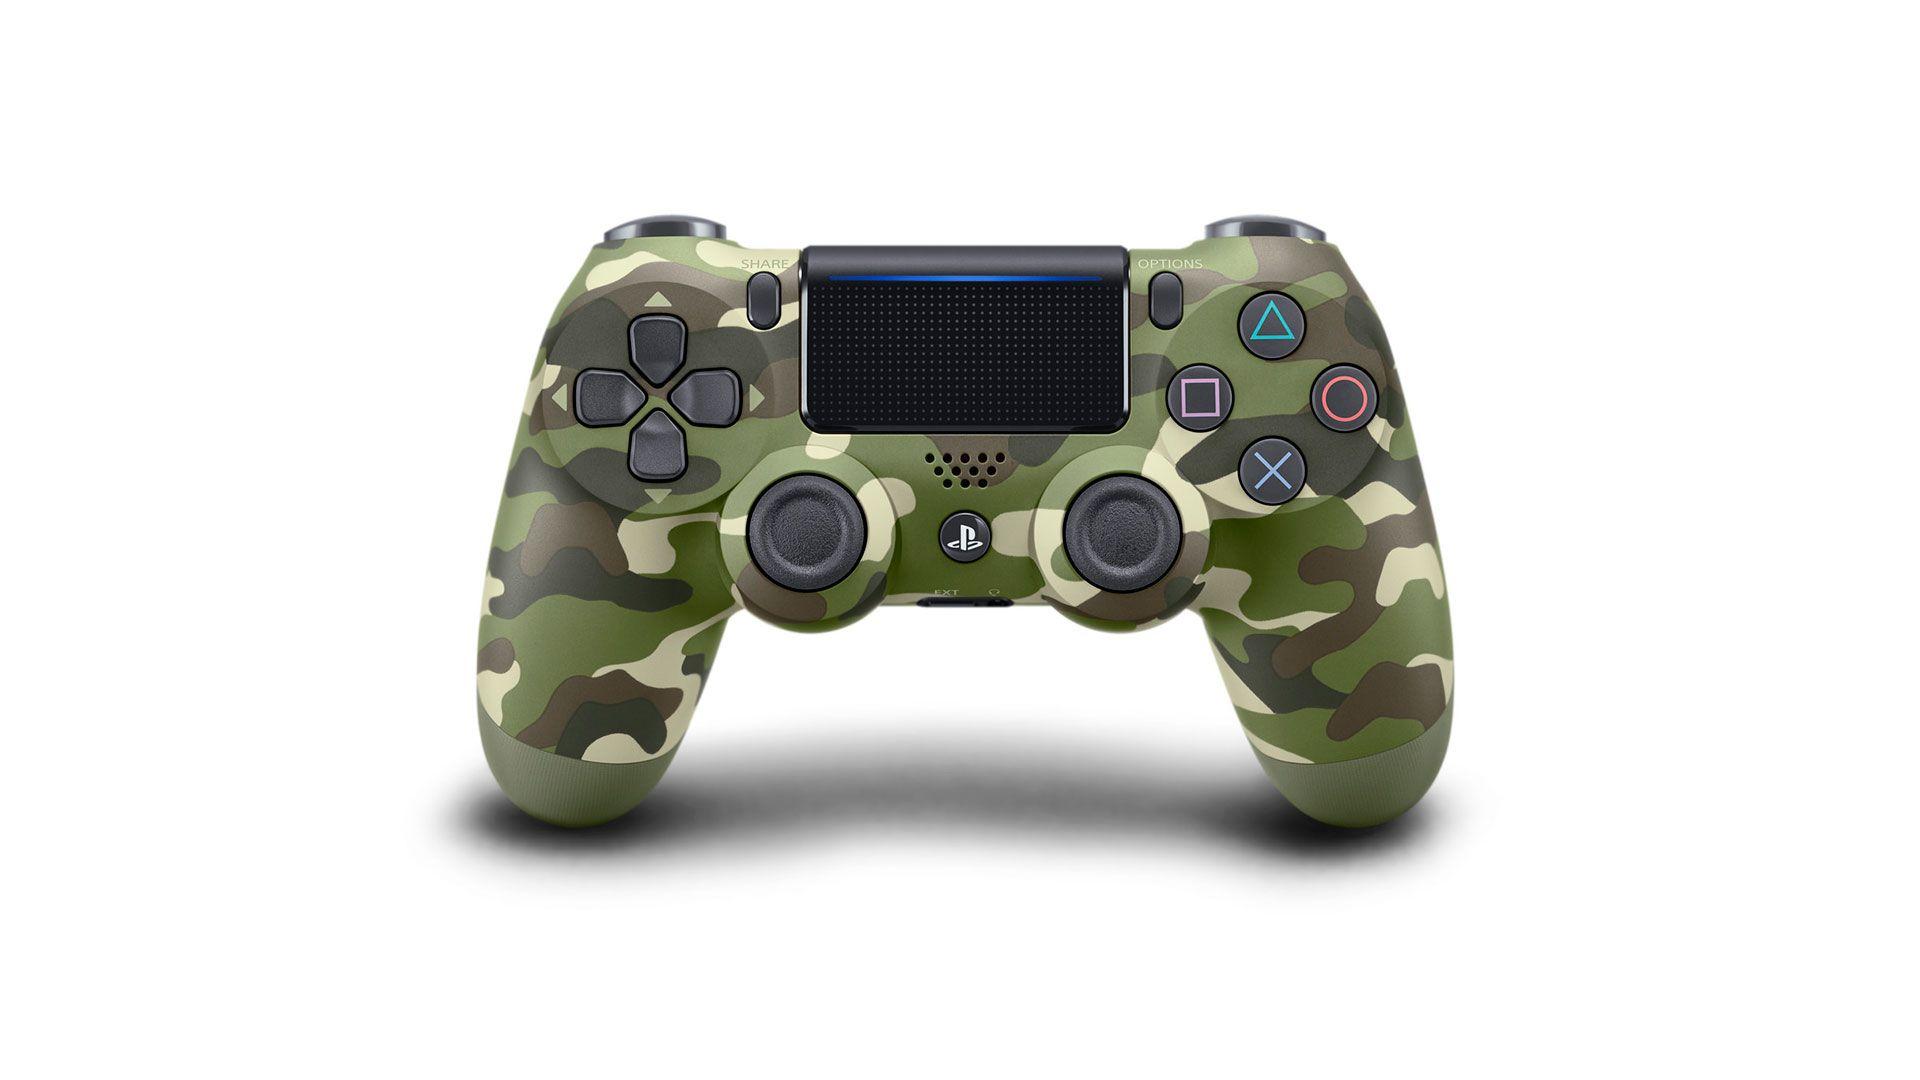 Sony DualShock 4 V2 геймпад для PS4 зеленый камуфляж [PS4DSGC]